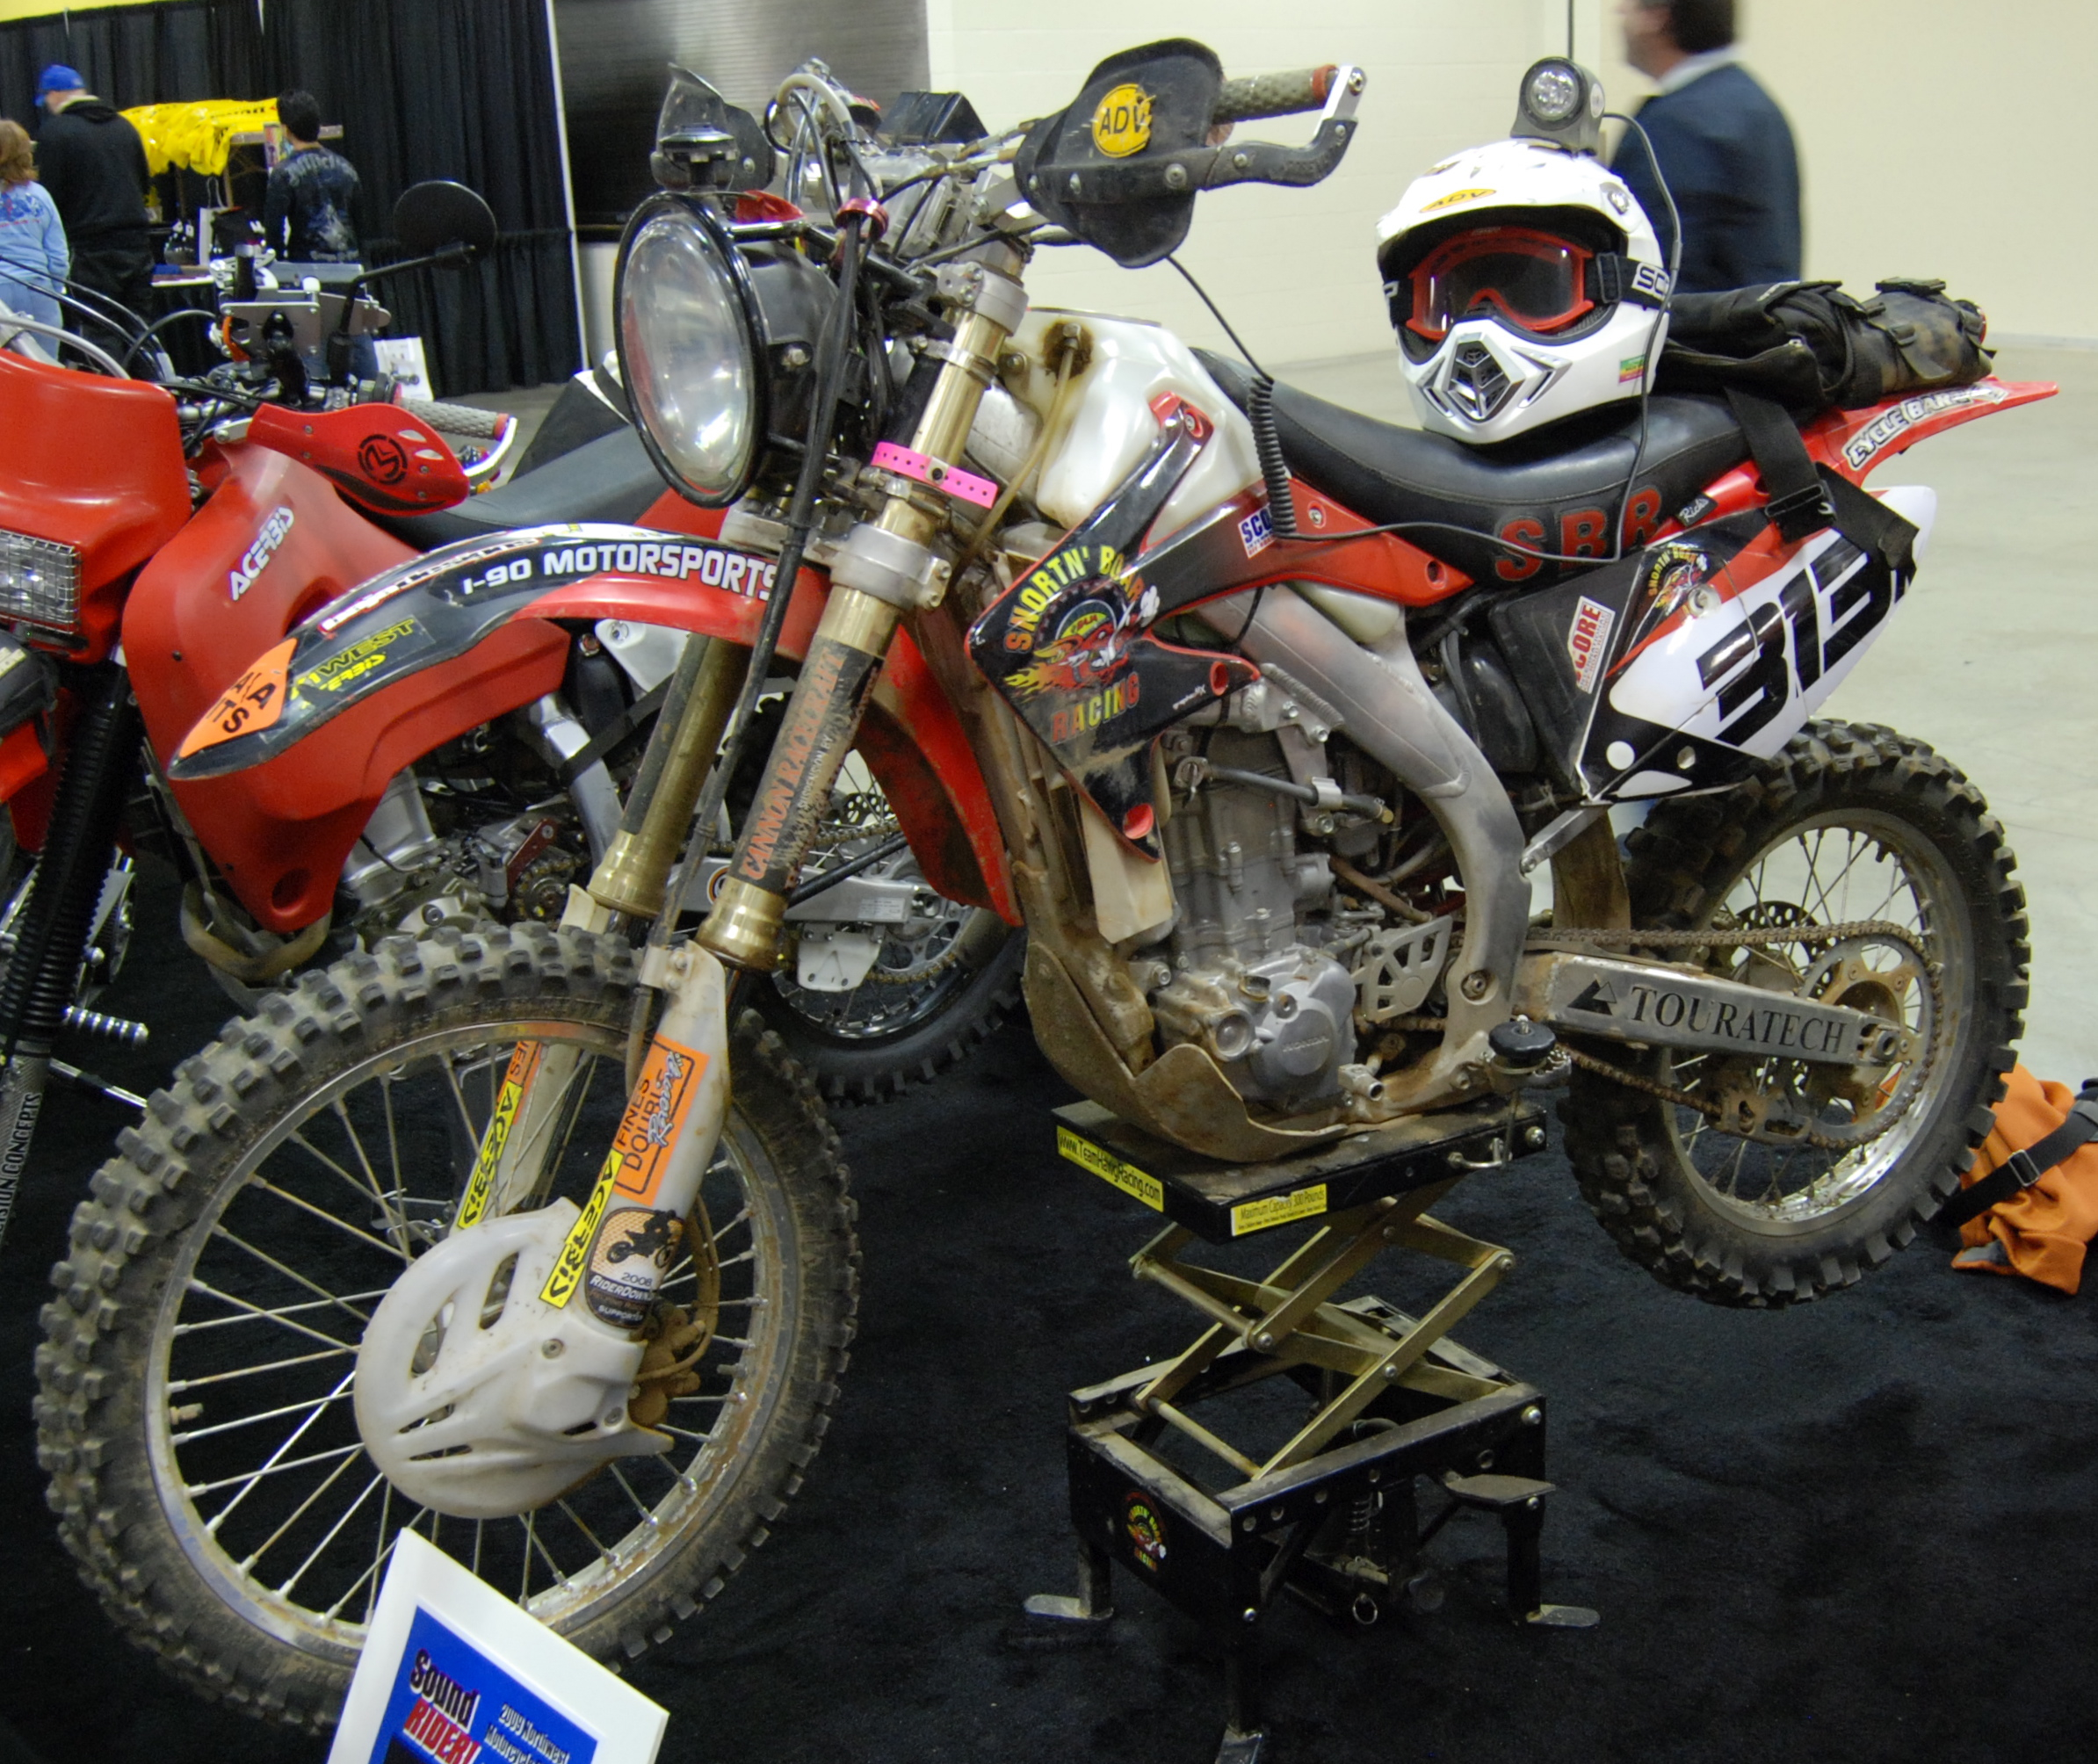 Honda Of Seattle >> File:2007 Honda CRF450X at the 2009 Seattle International Motorcycle Show 1.jpg - Wikimedia Commons